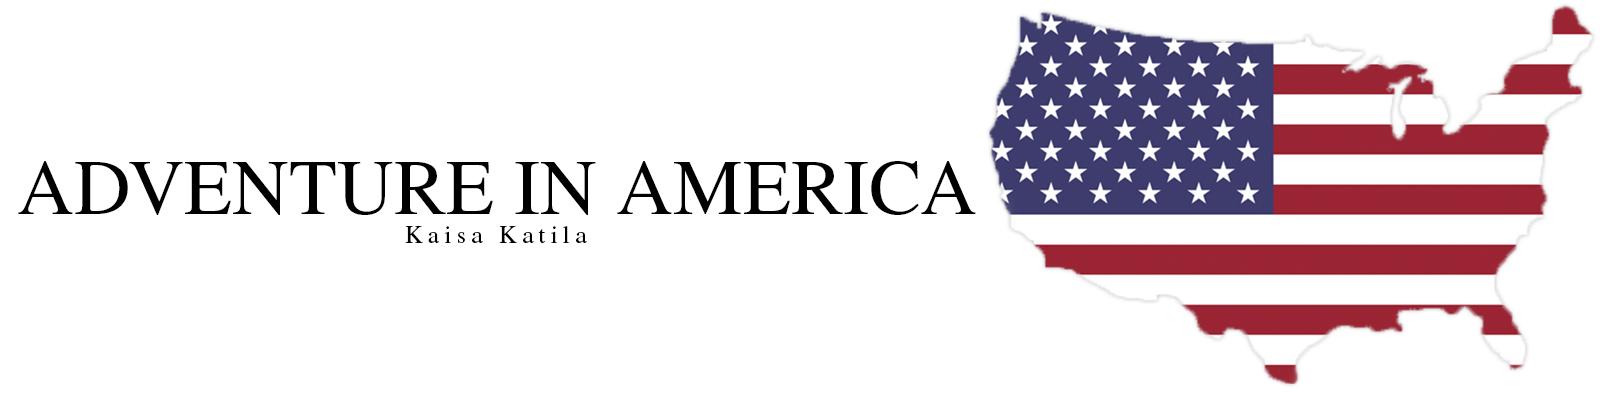 Adventure in America